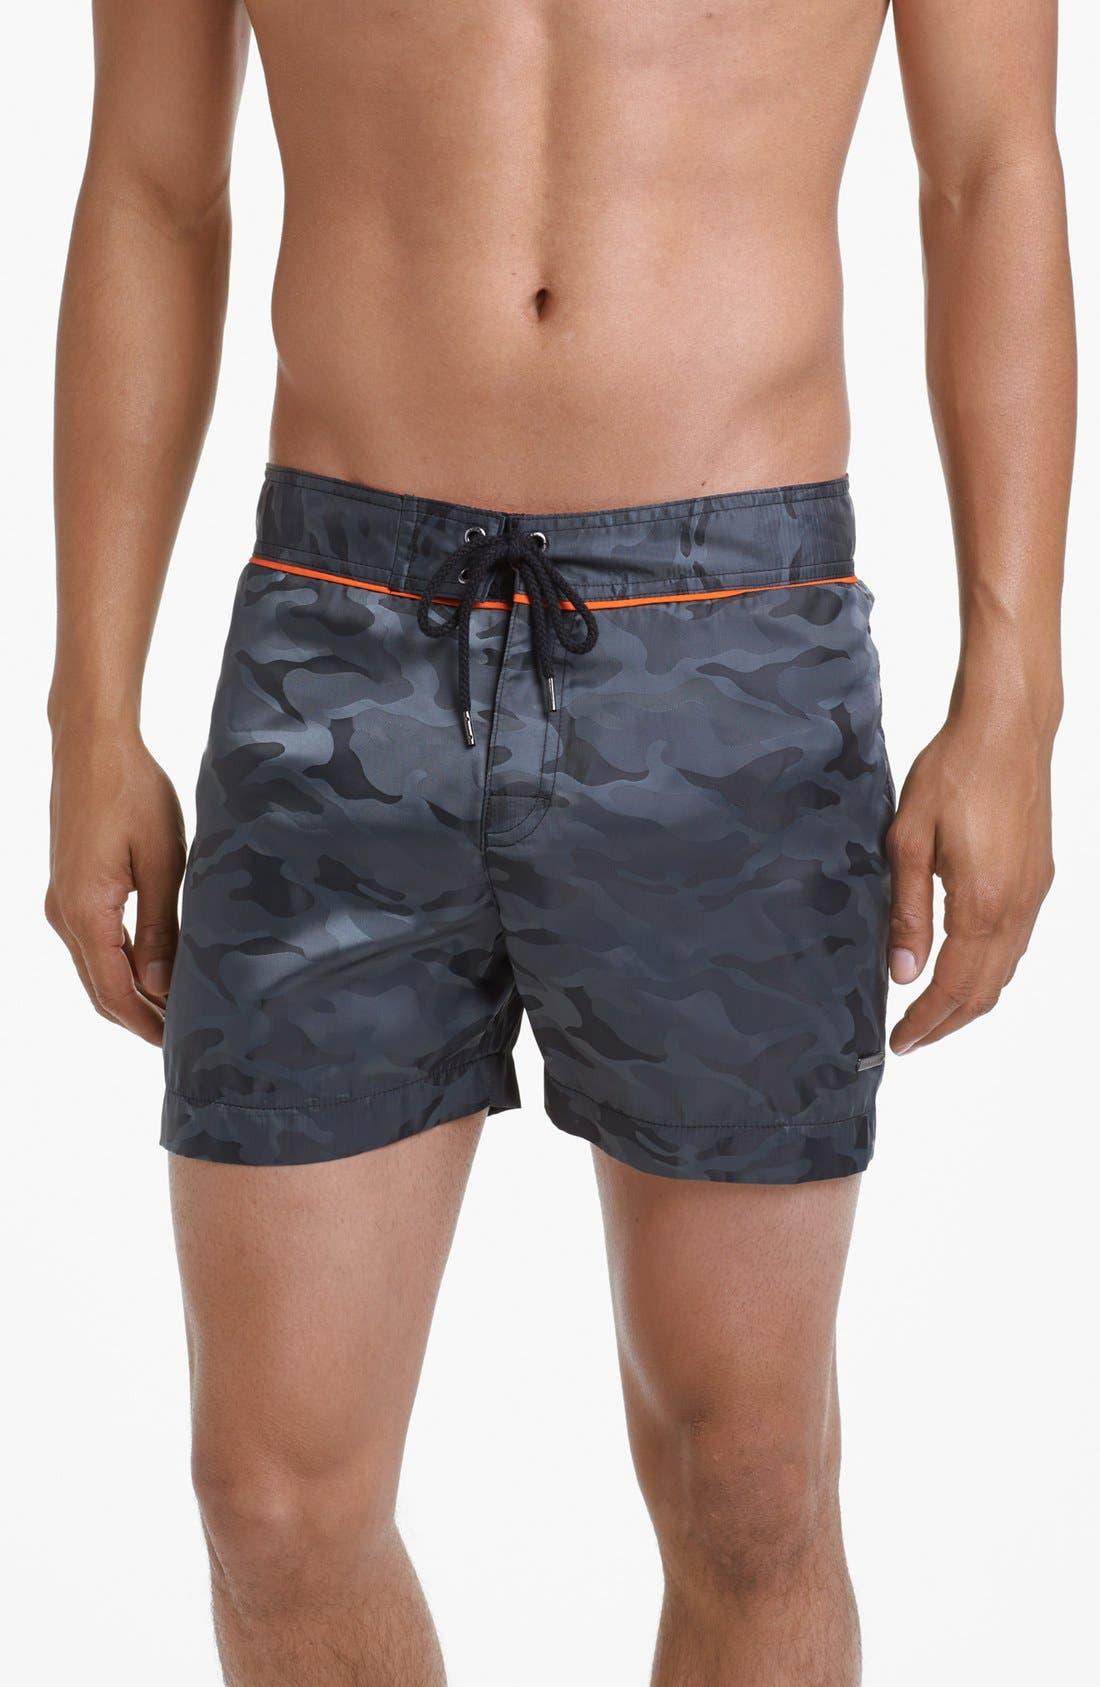 Alternate Image 1 Selected - Parke & Ronen Classic Camo Print Swim Shorts